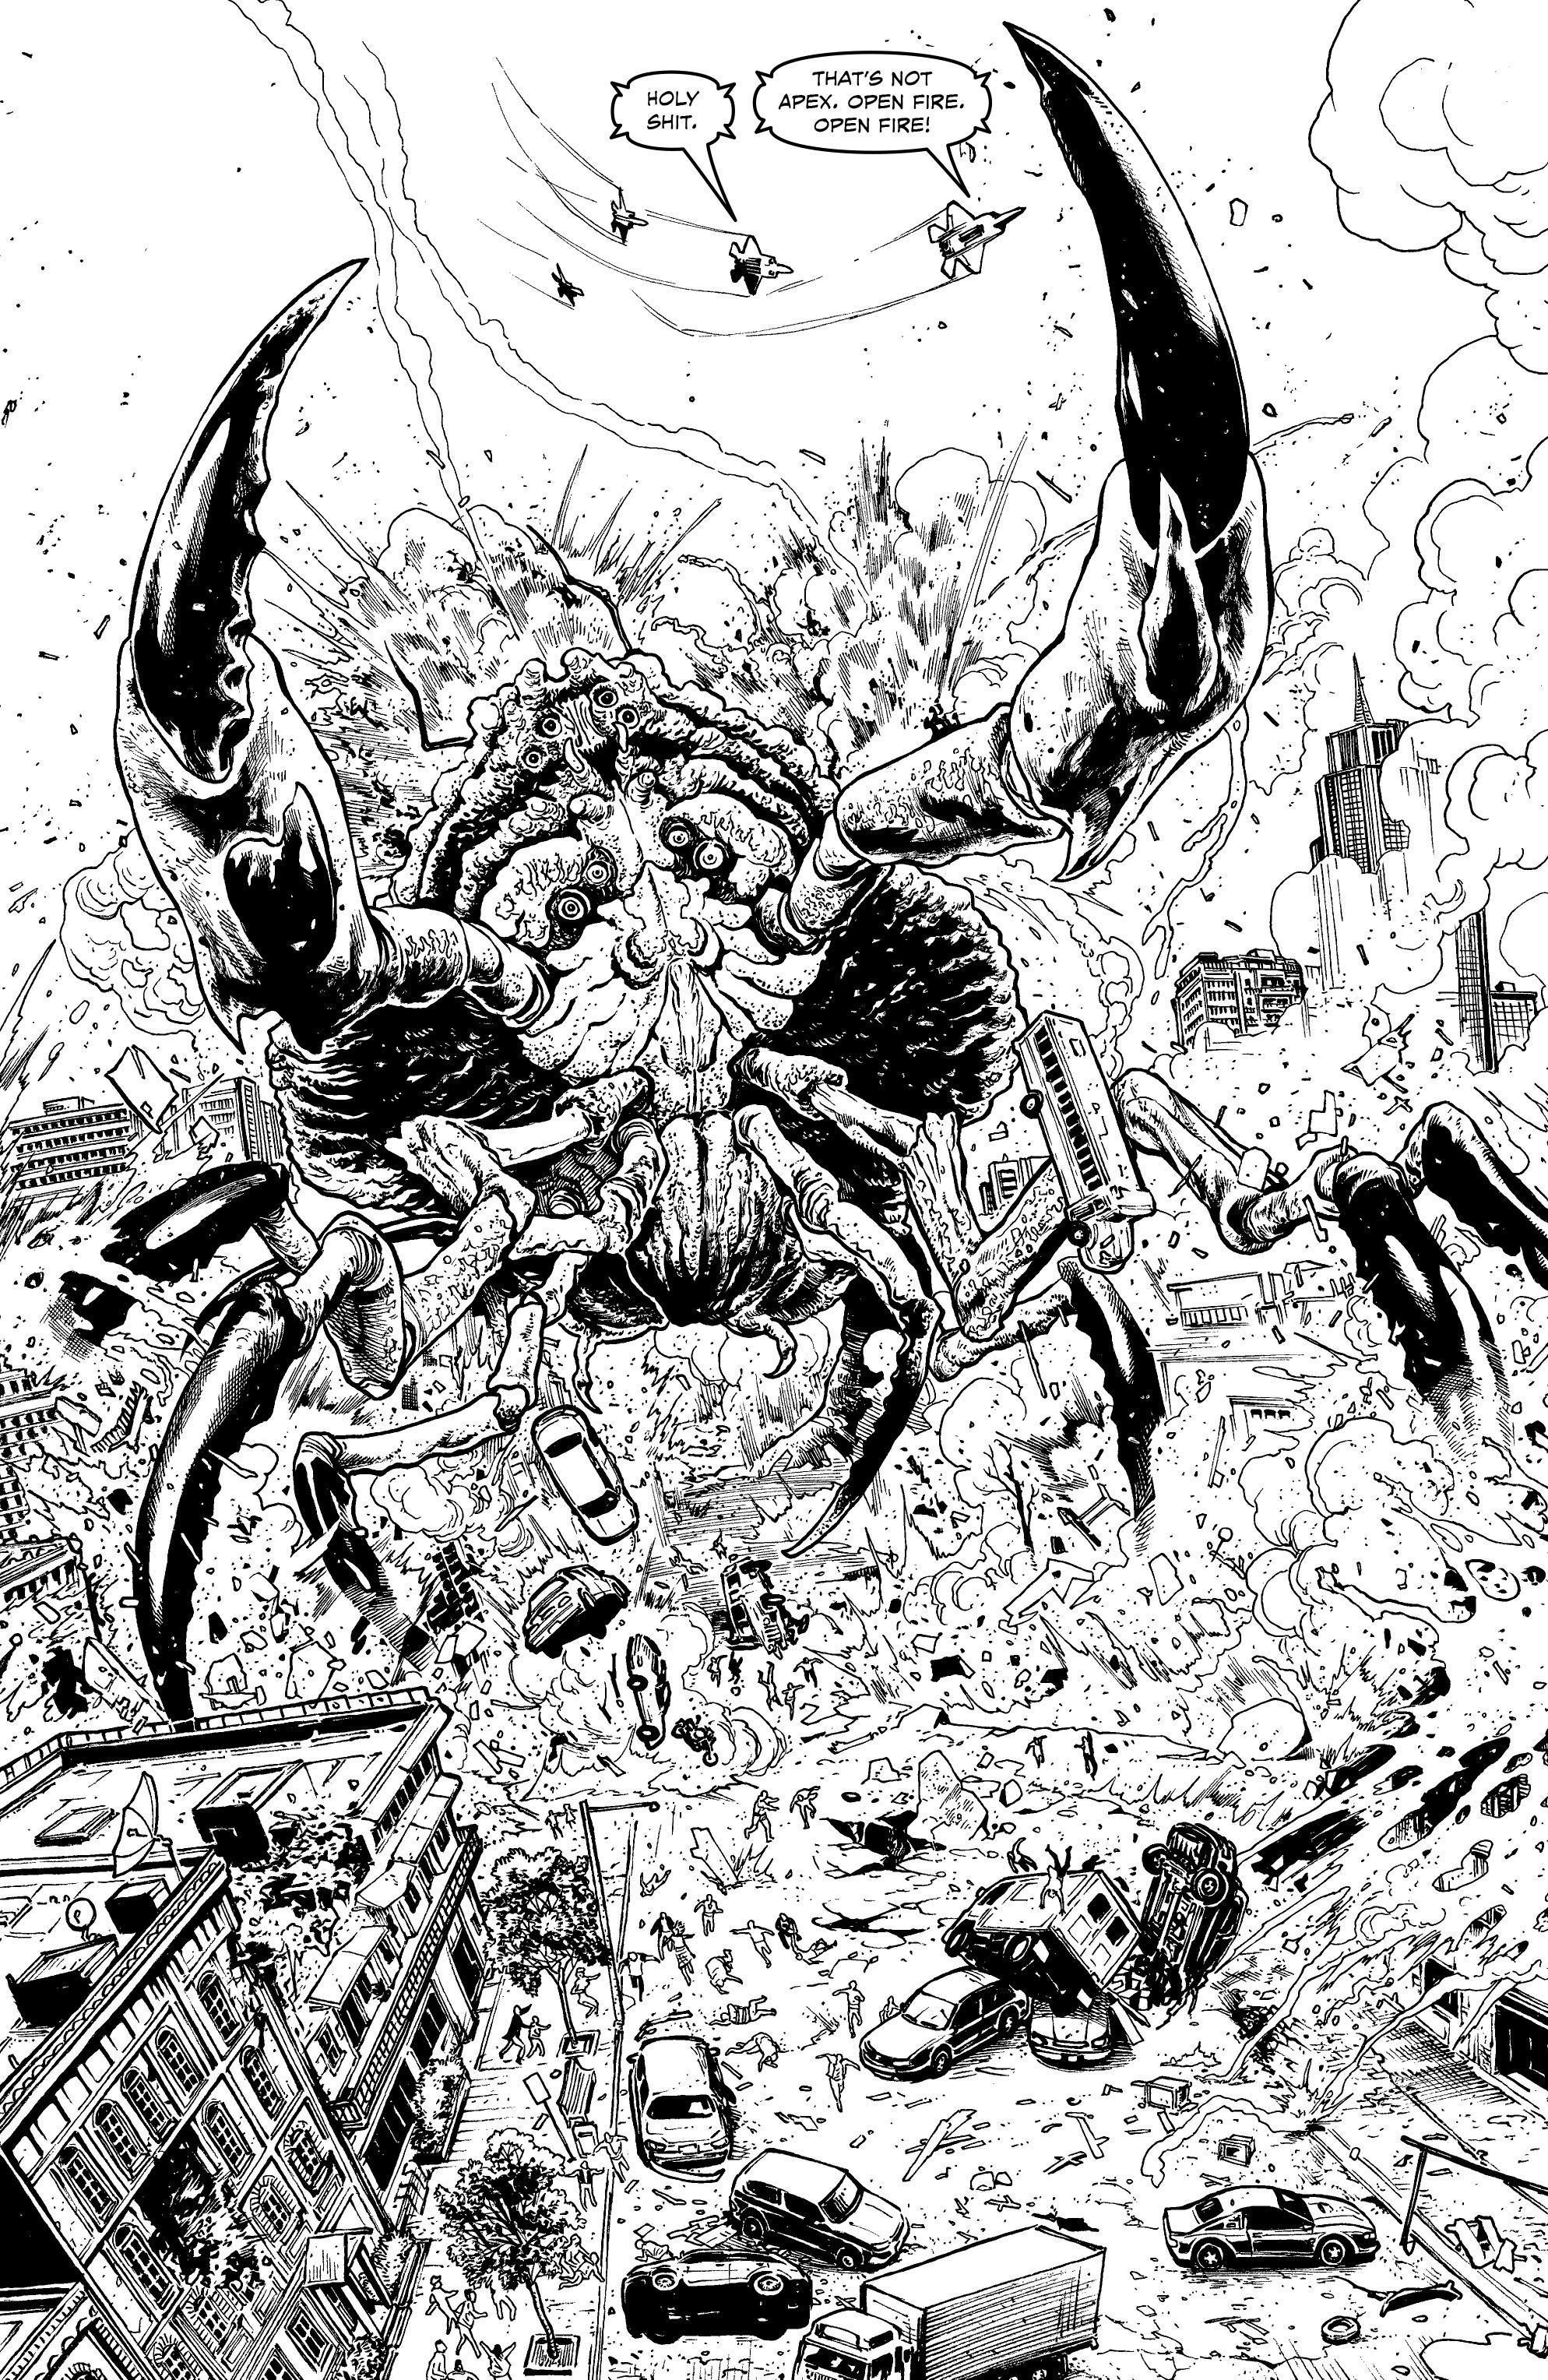 Read online Alan Moore's Cinema Purgatorio comic -  Issue #1 - 46